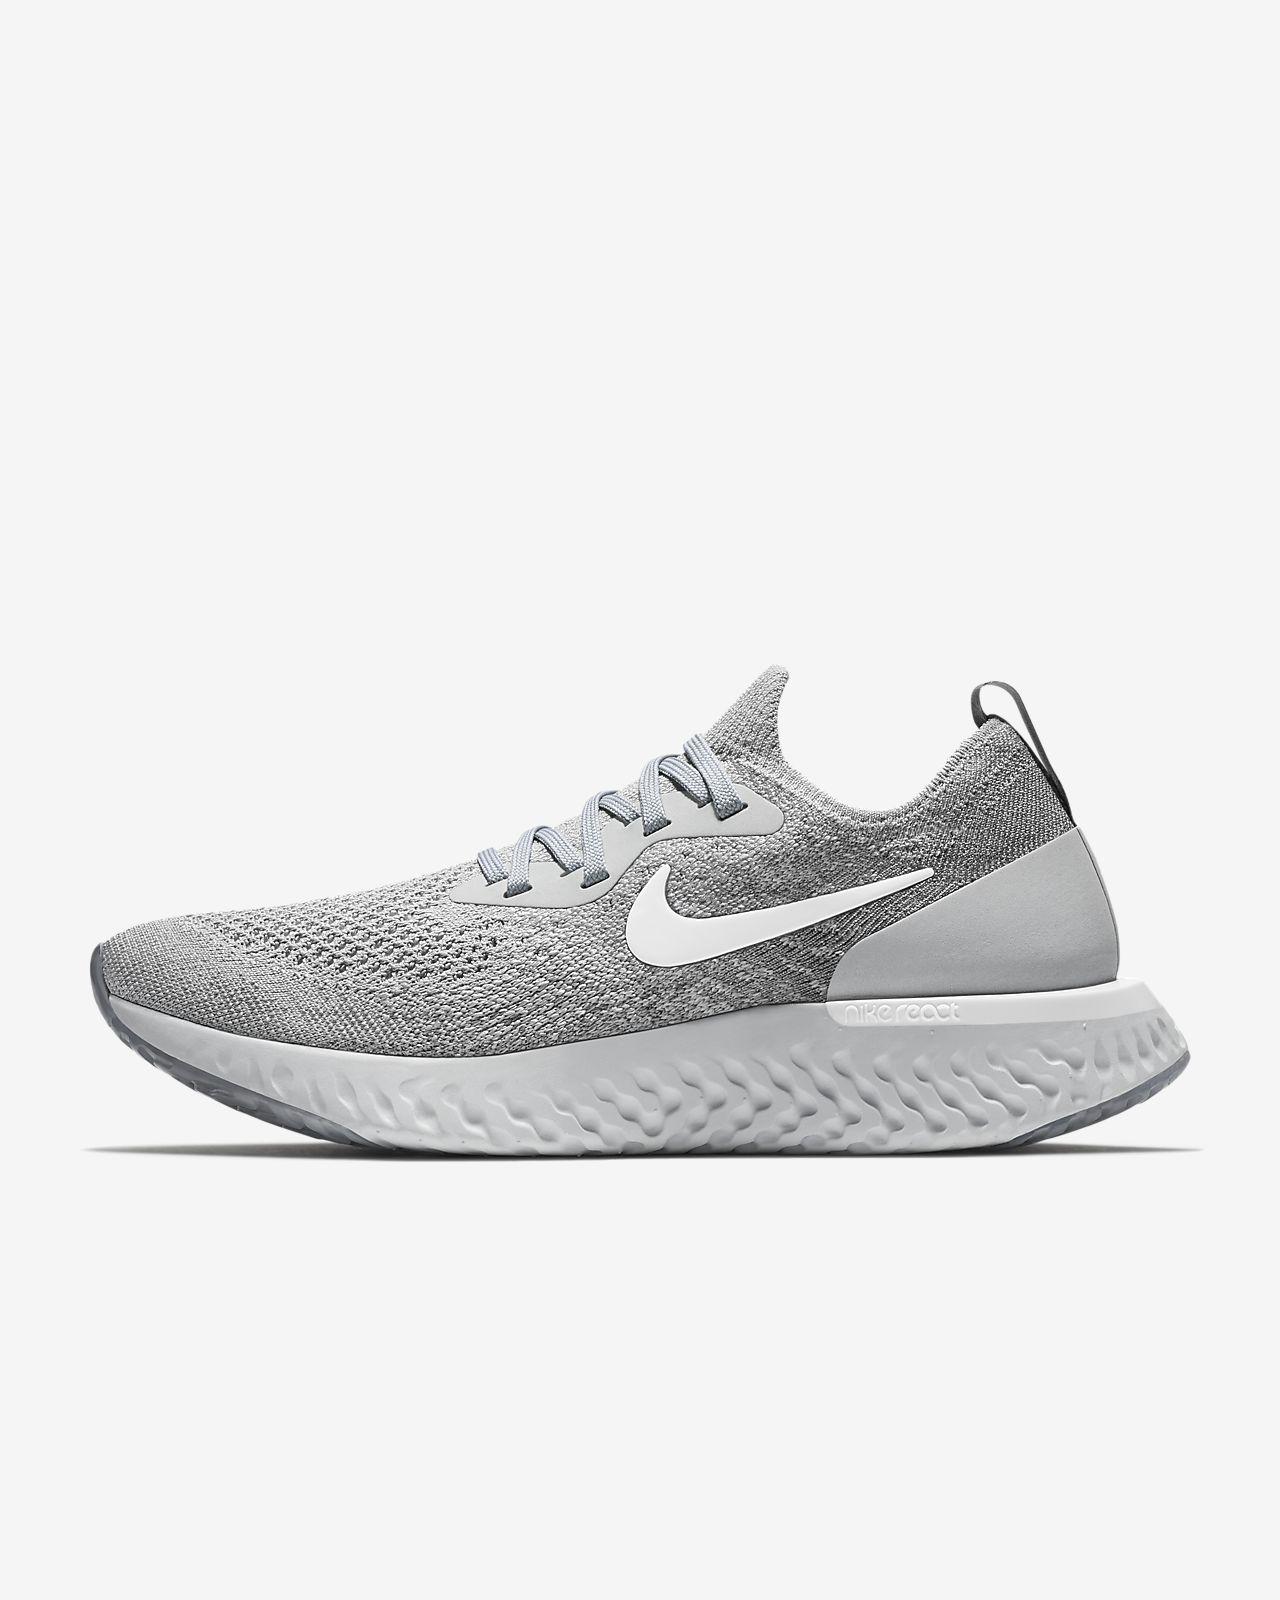 ... Chaussure de running Nike Epic React Flyknit pour Femme